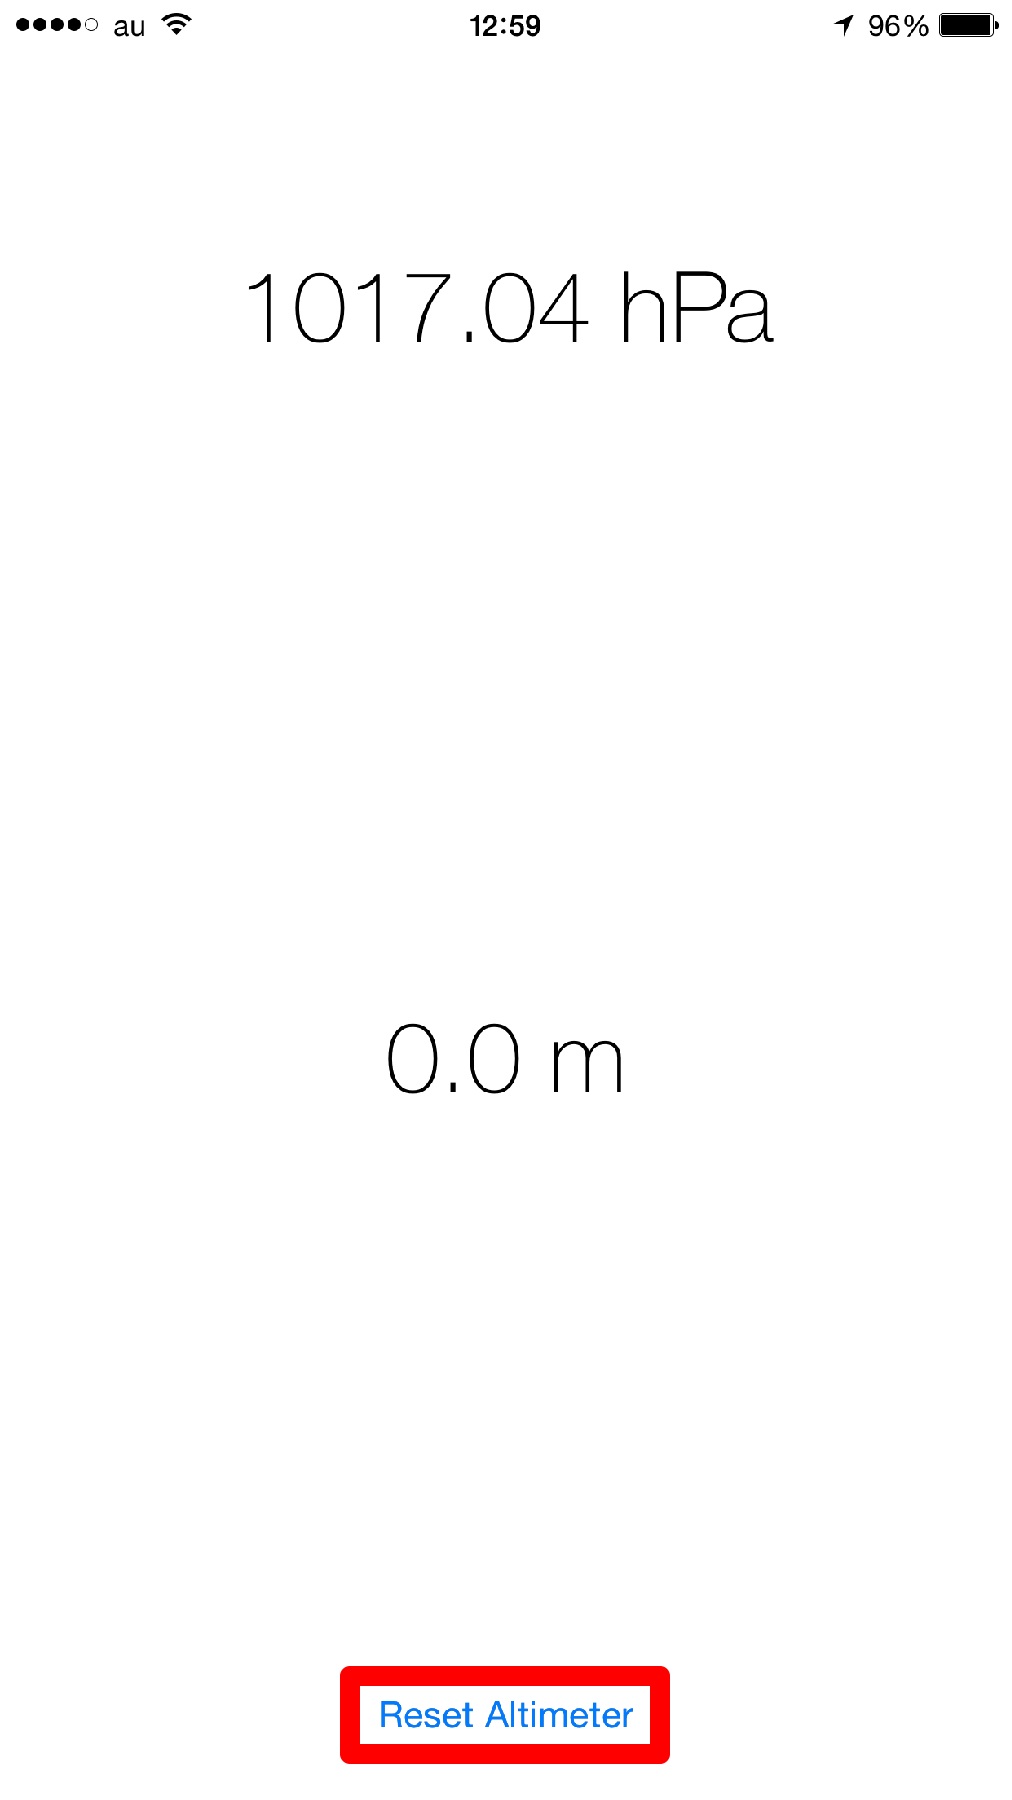 [Barometer]をインストールする